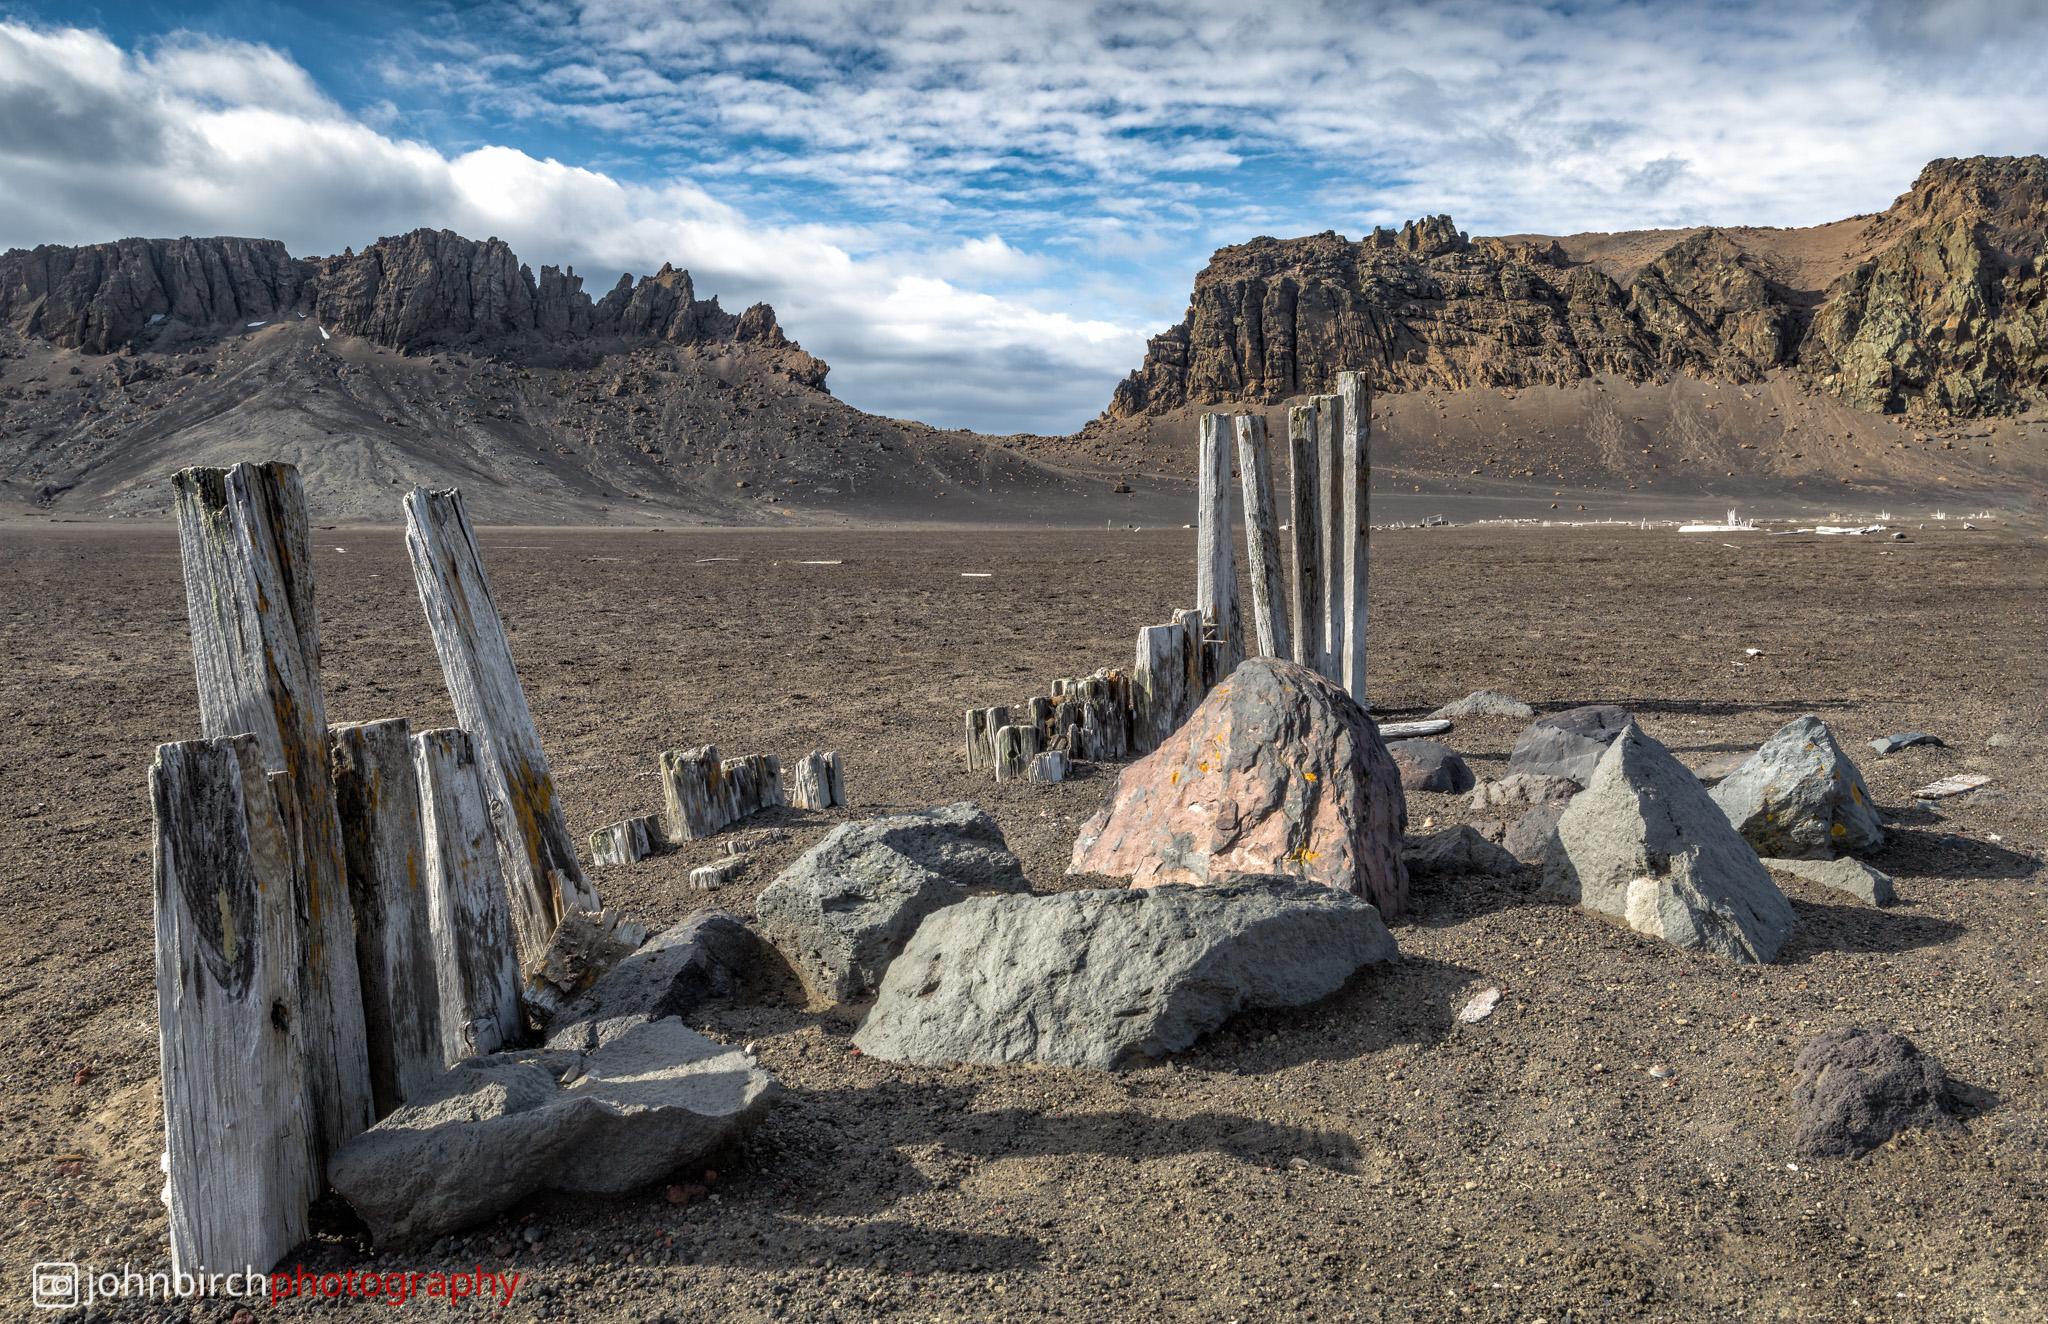 Whaler's Bay Ruins